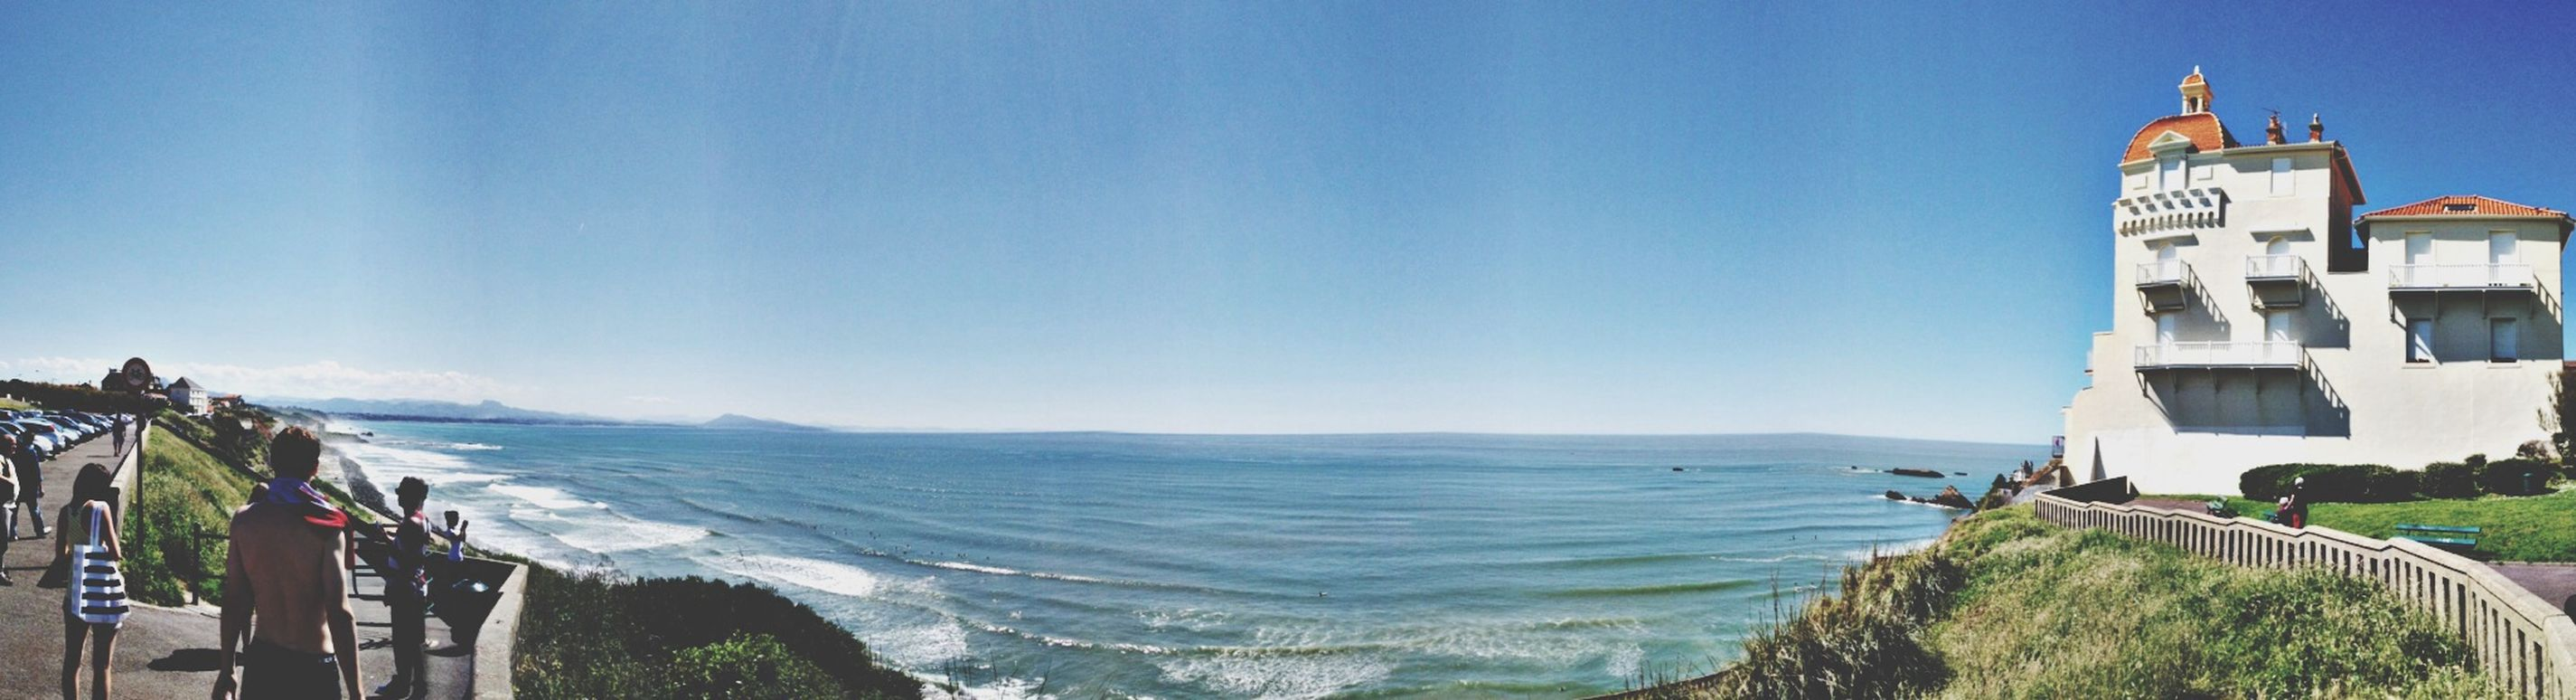 Panorama Sea Enjoying The View Surfing The Adventure Handbook